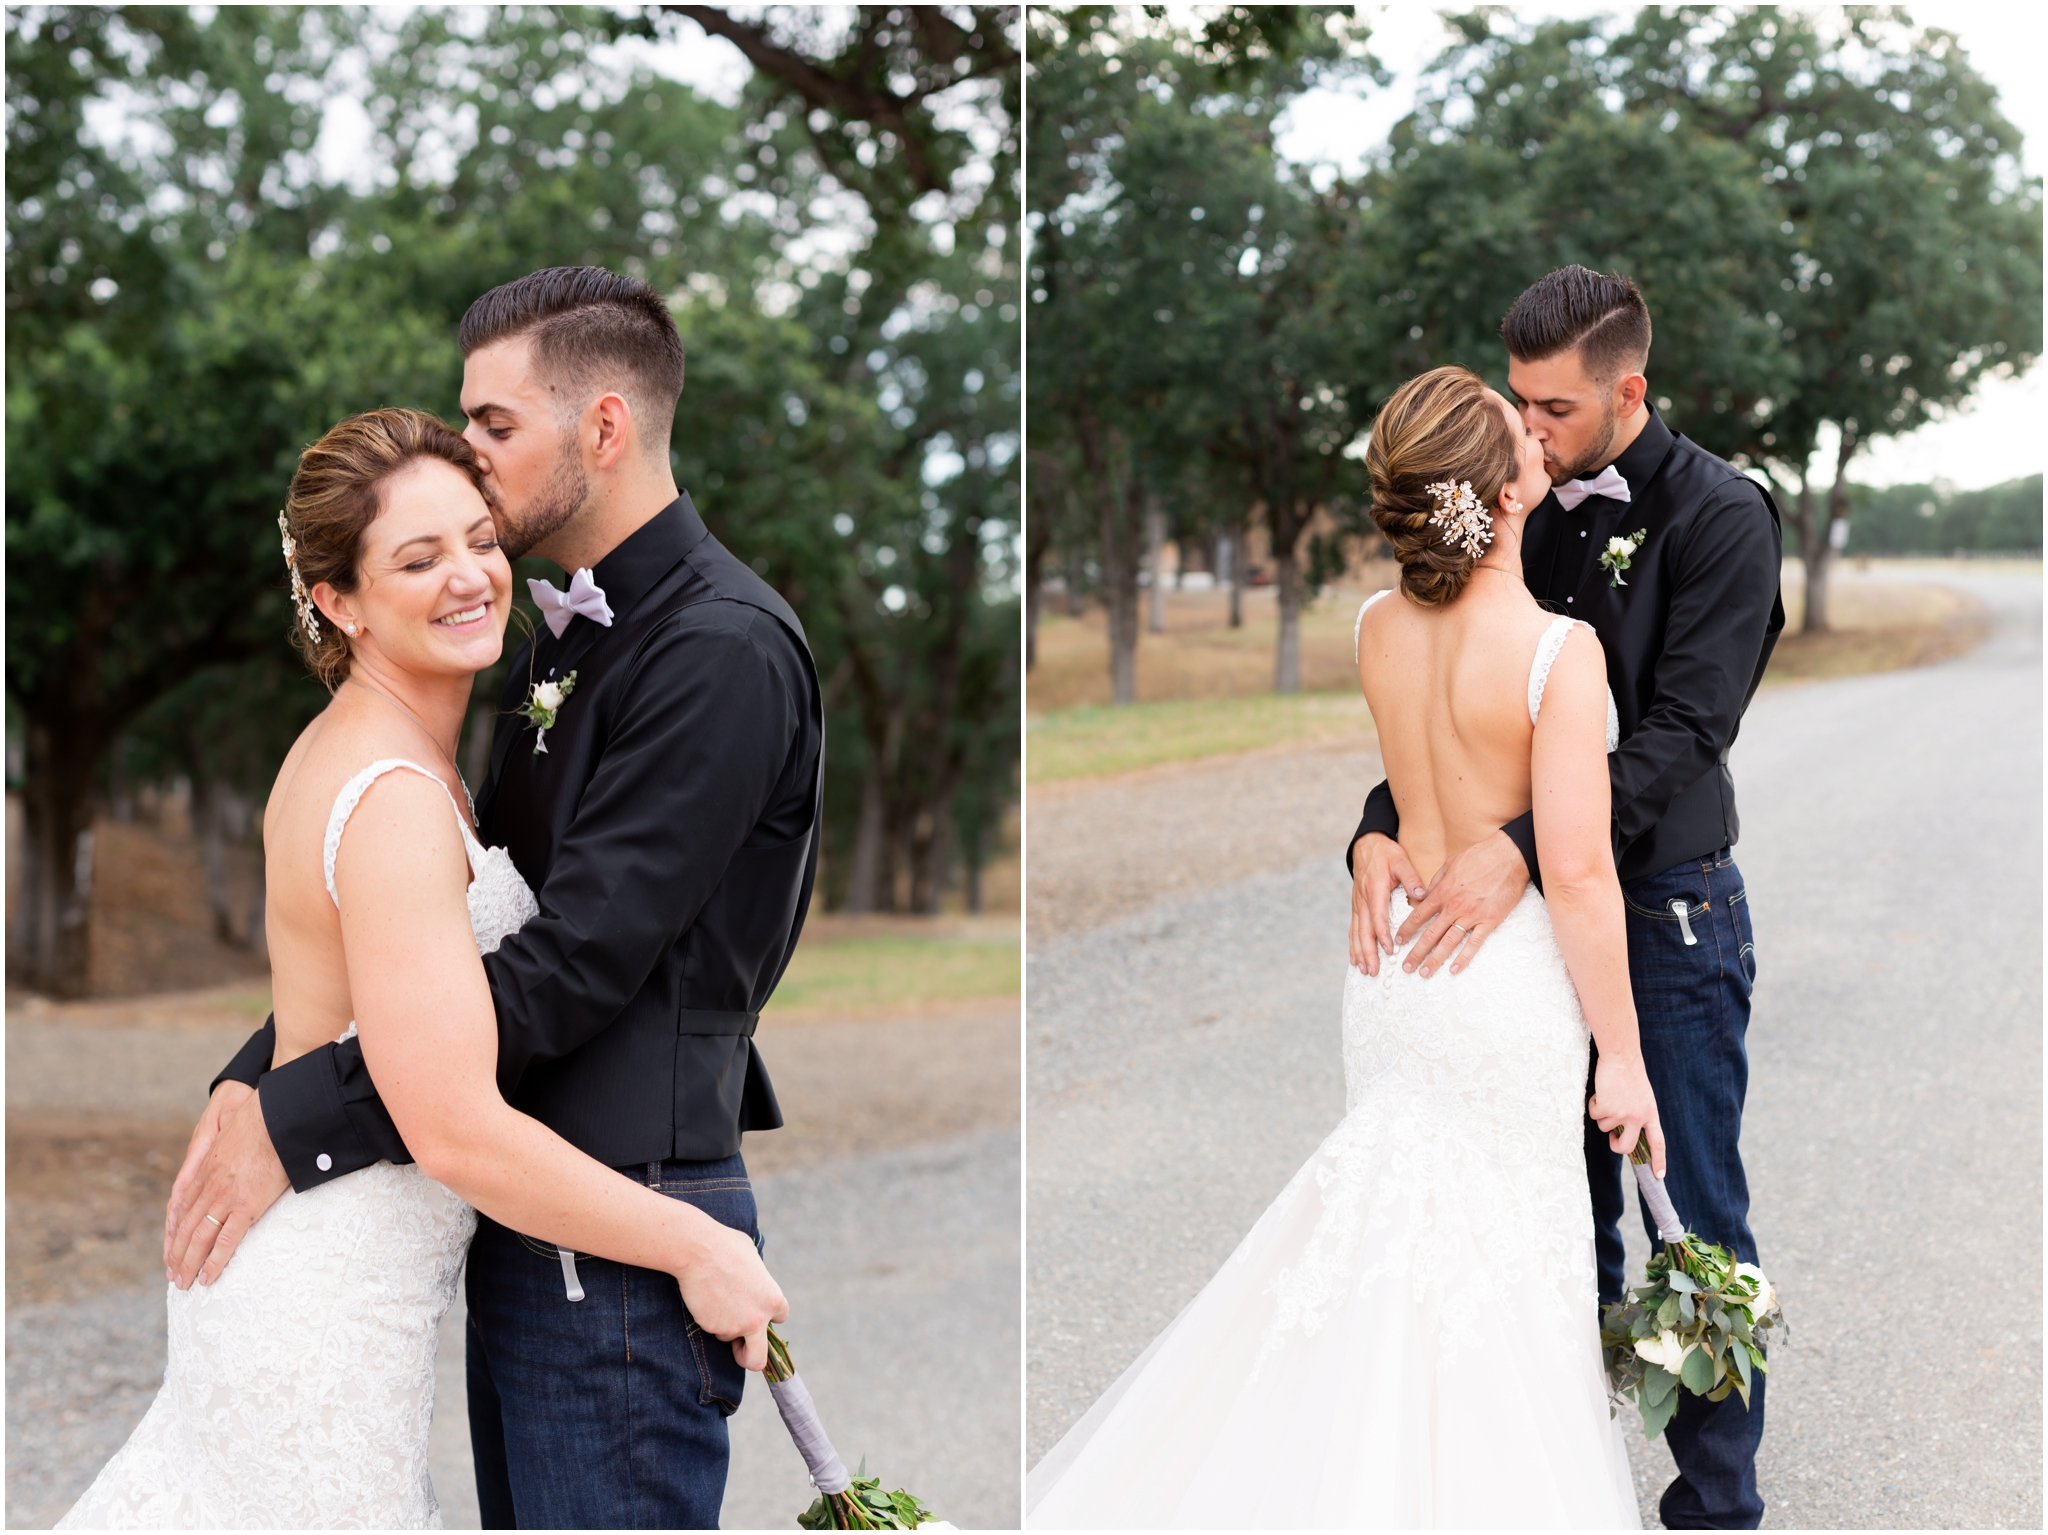 katrina_darren_little_bear_creek_ranch_wedding_0014.jpg